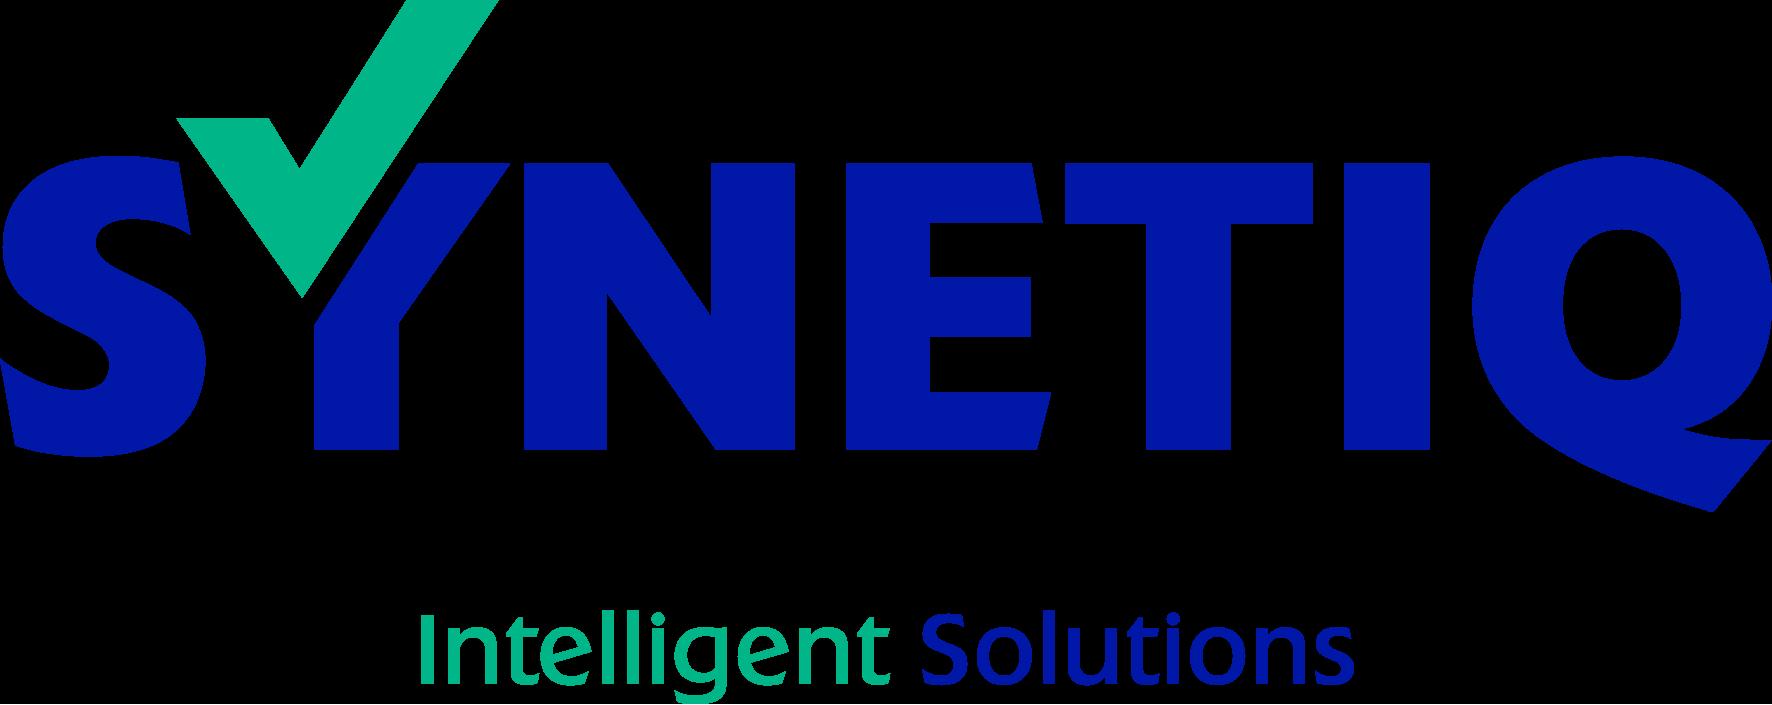 Synetiq Intelligent Solutions Logo Full ColourWEB